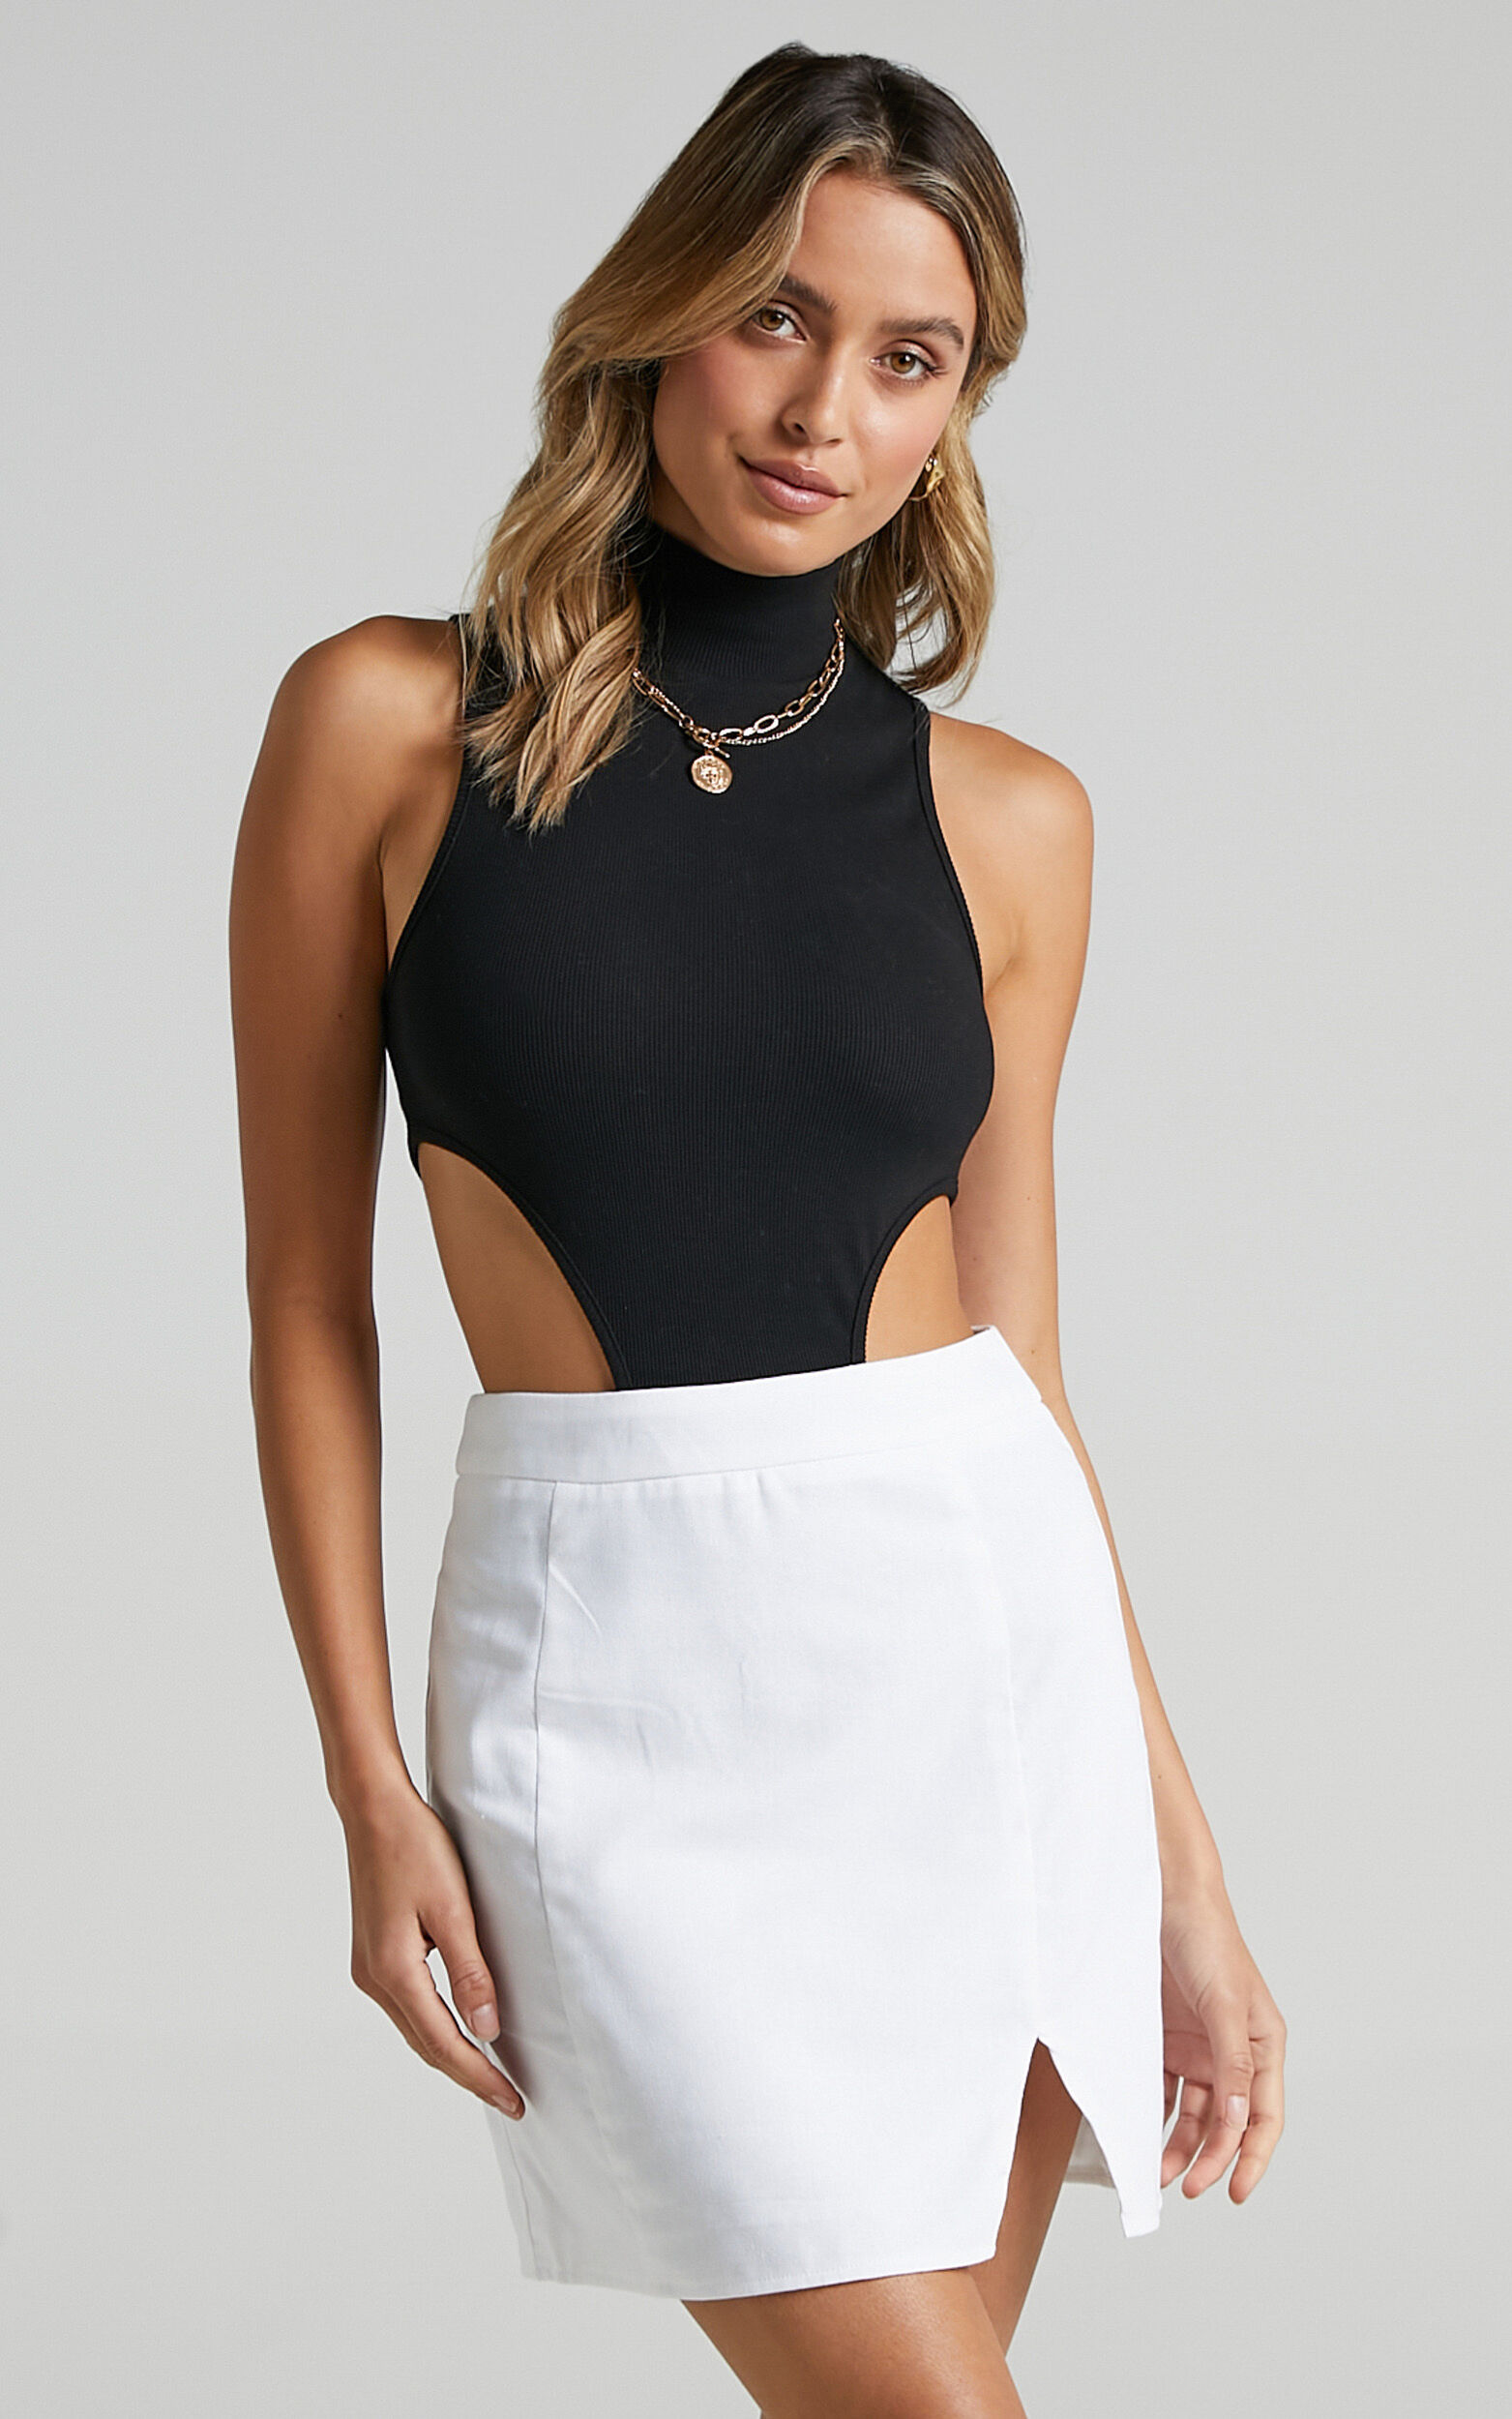 International Babe Mini Skirt in White Linen Look - 20, WHT9, super-hi-res image number null